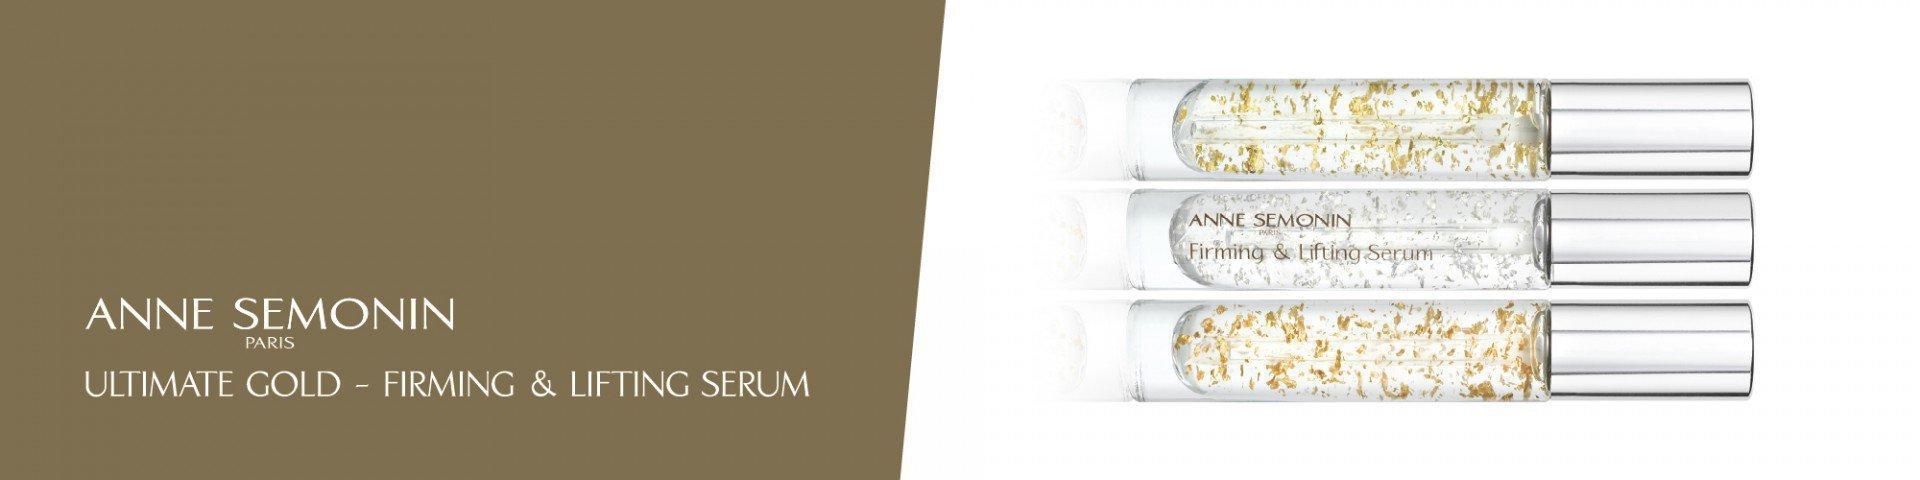 Firming & Lifting Serum Gold с 1.09